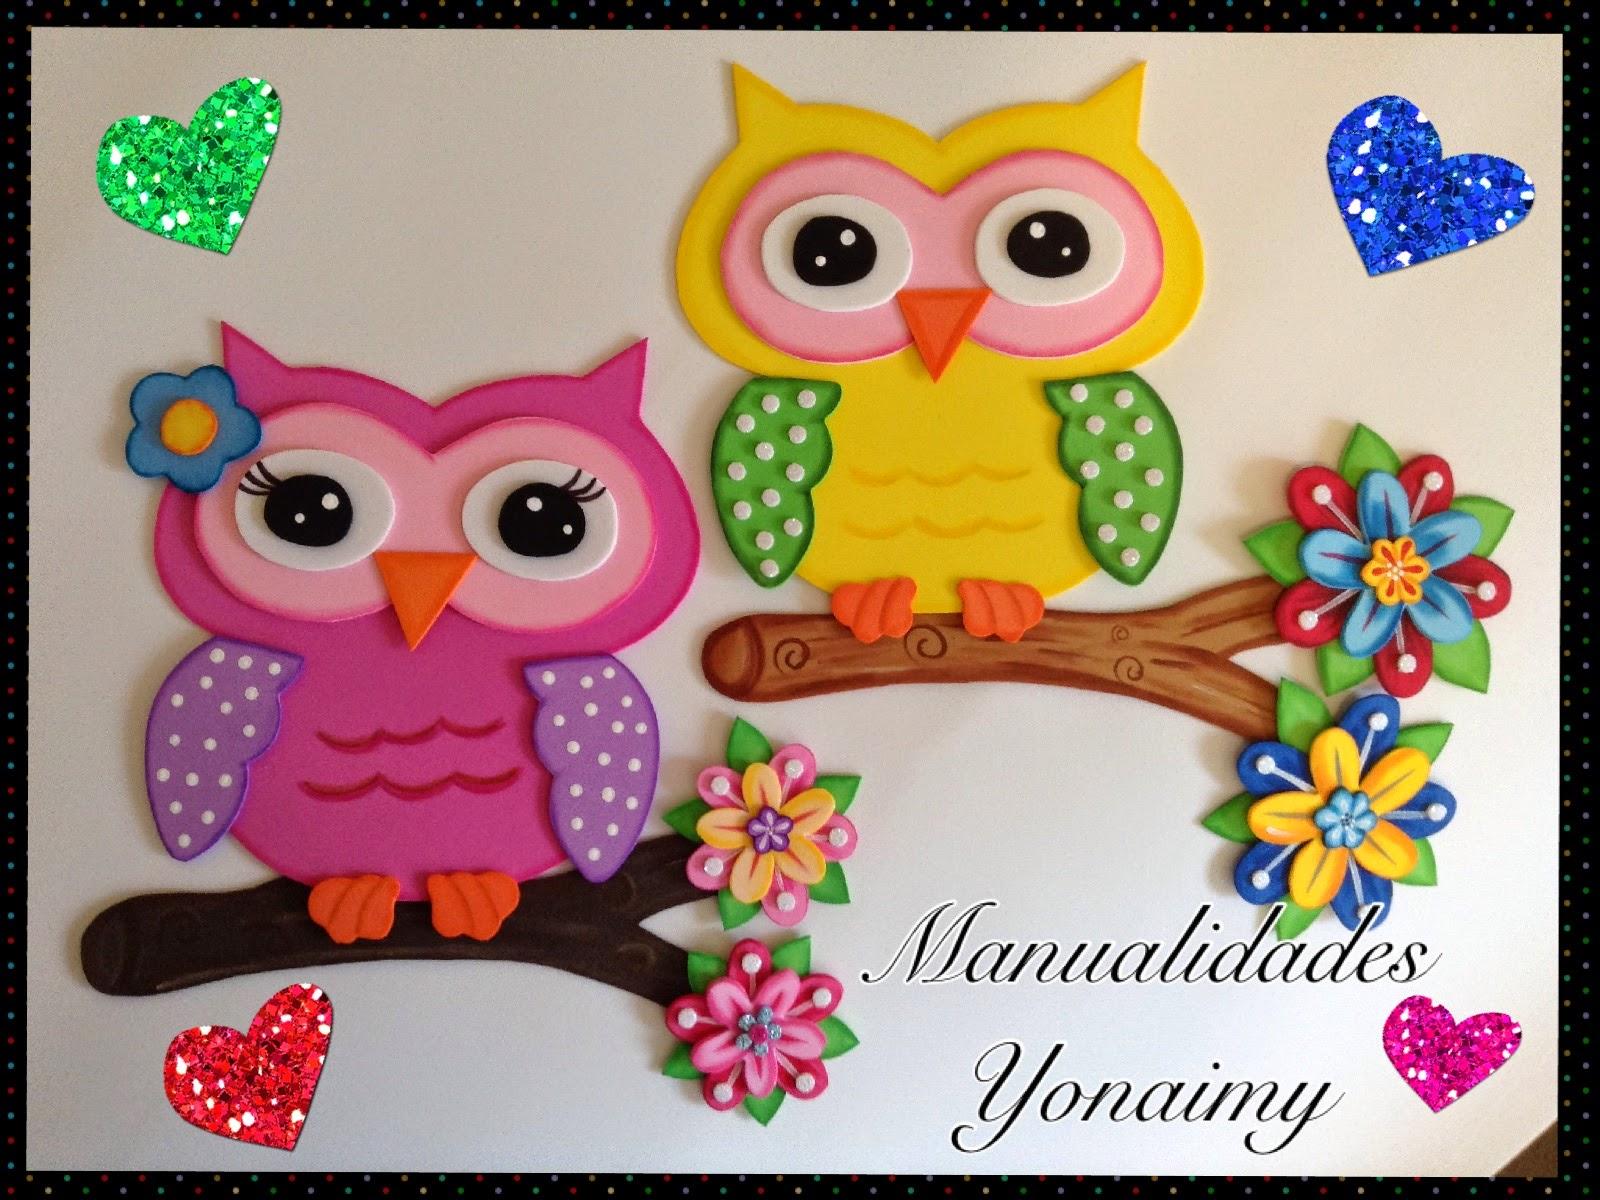 Manualidades yonaimy - Dibujos en goma eva ...